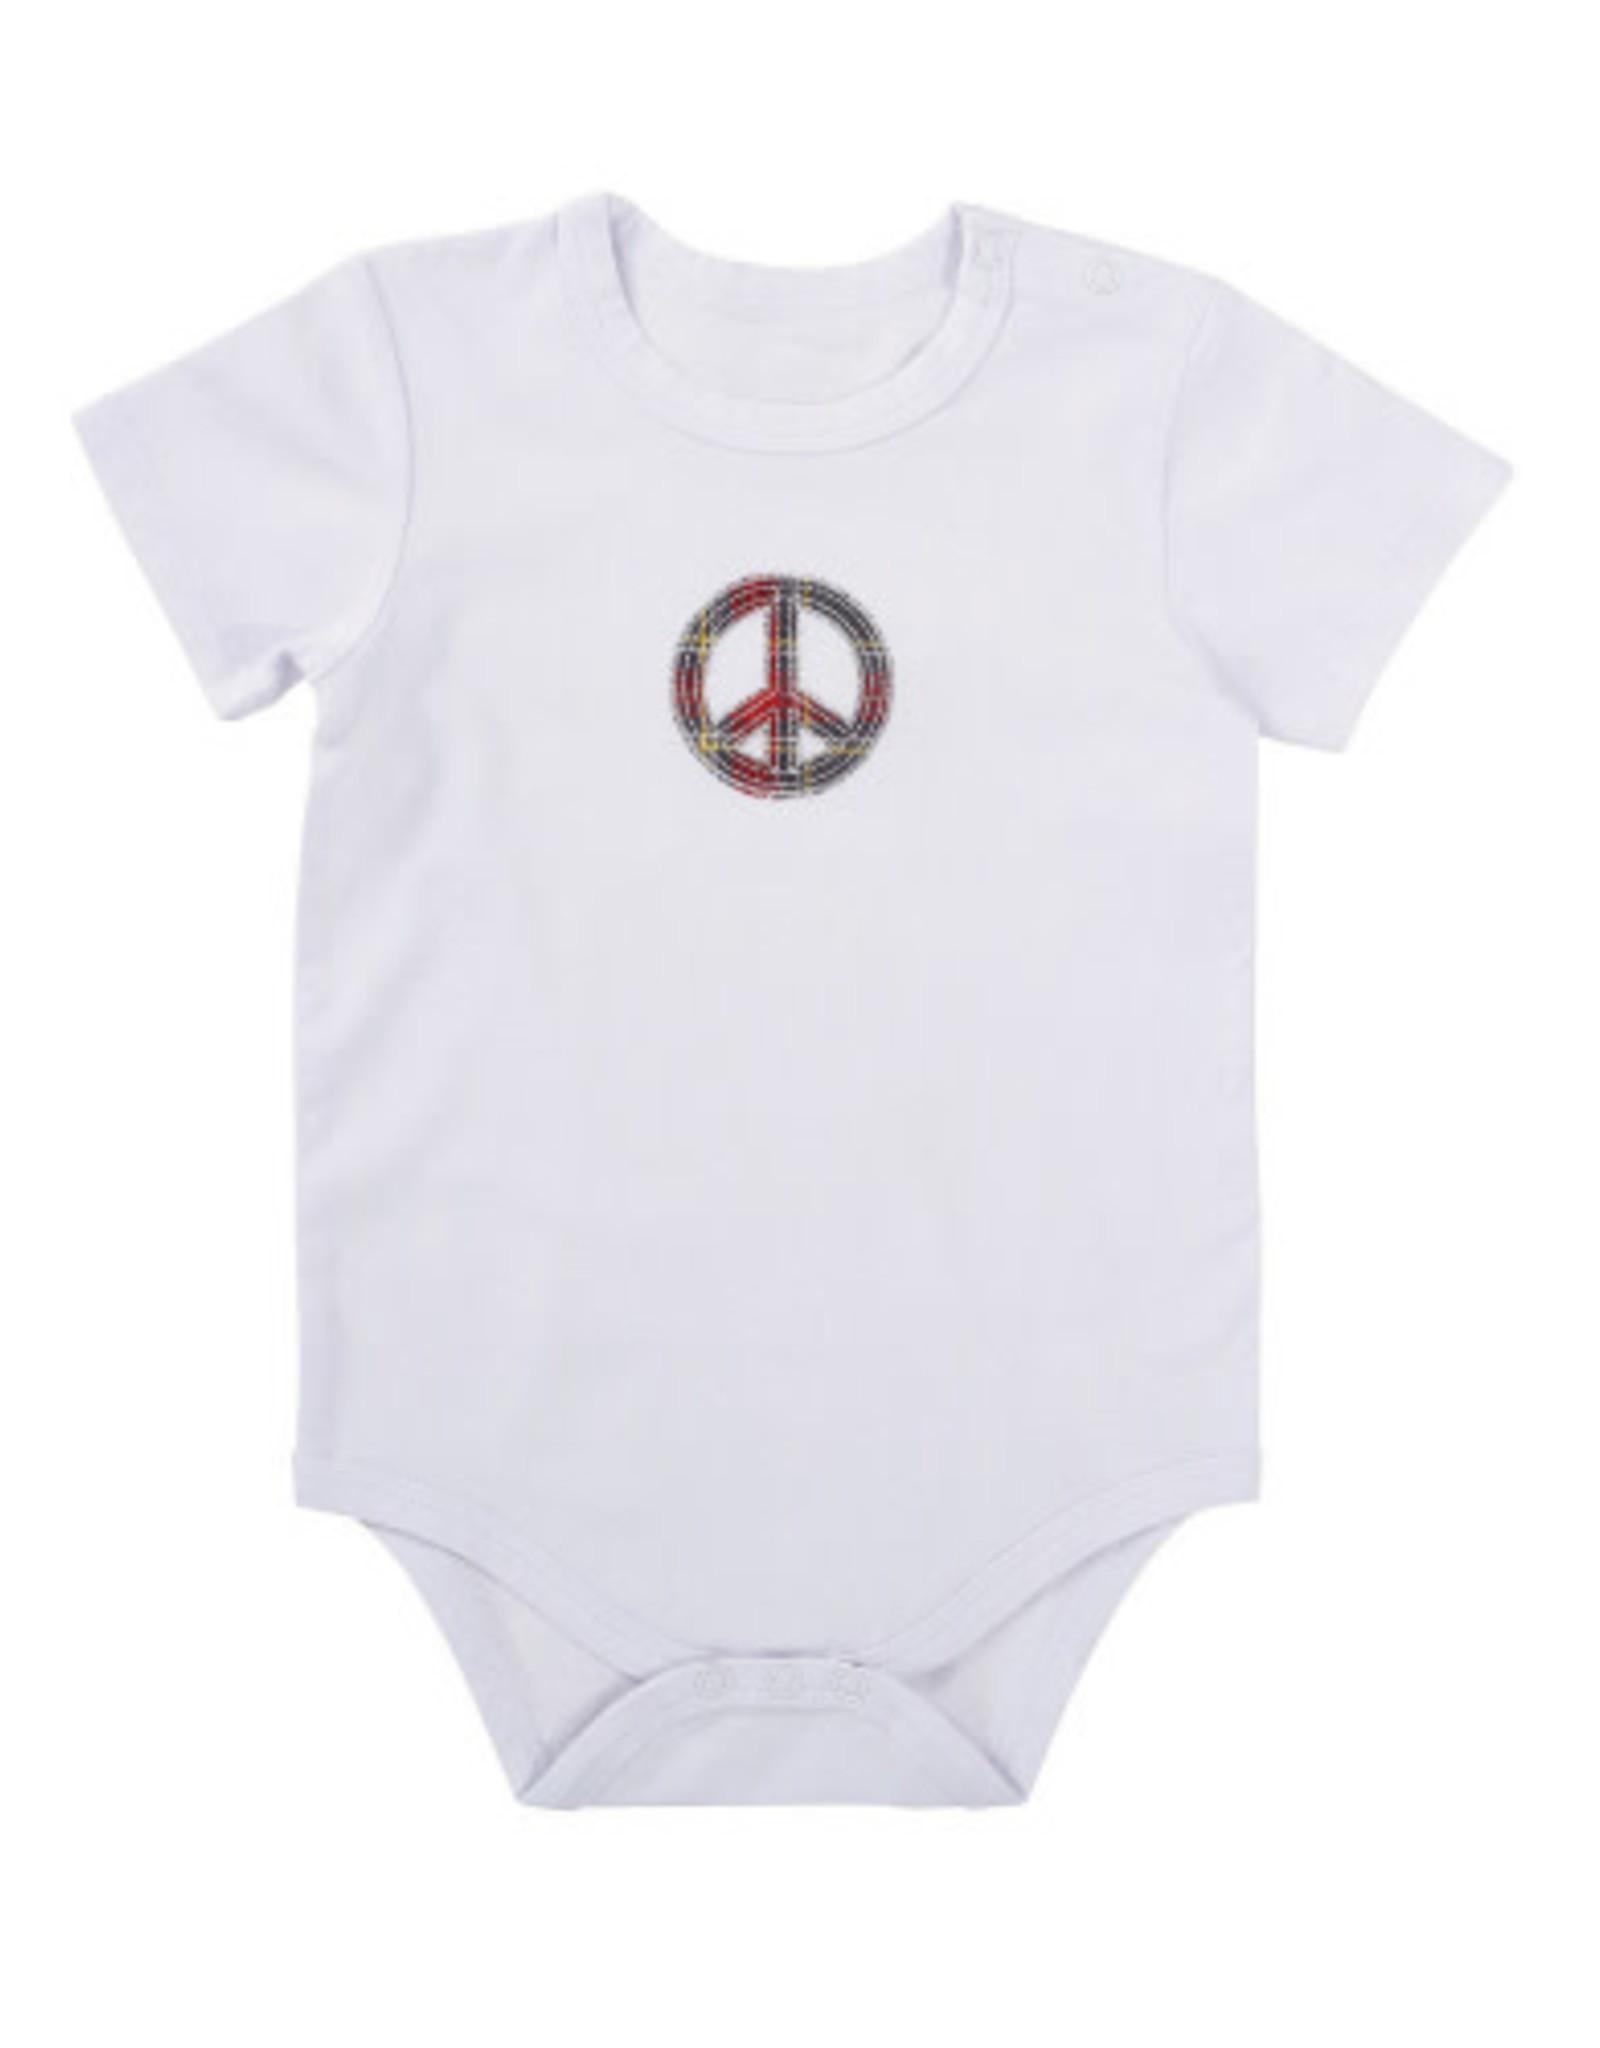 Creative Brands Snapshirt White Plaid Peace